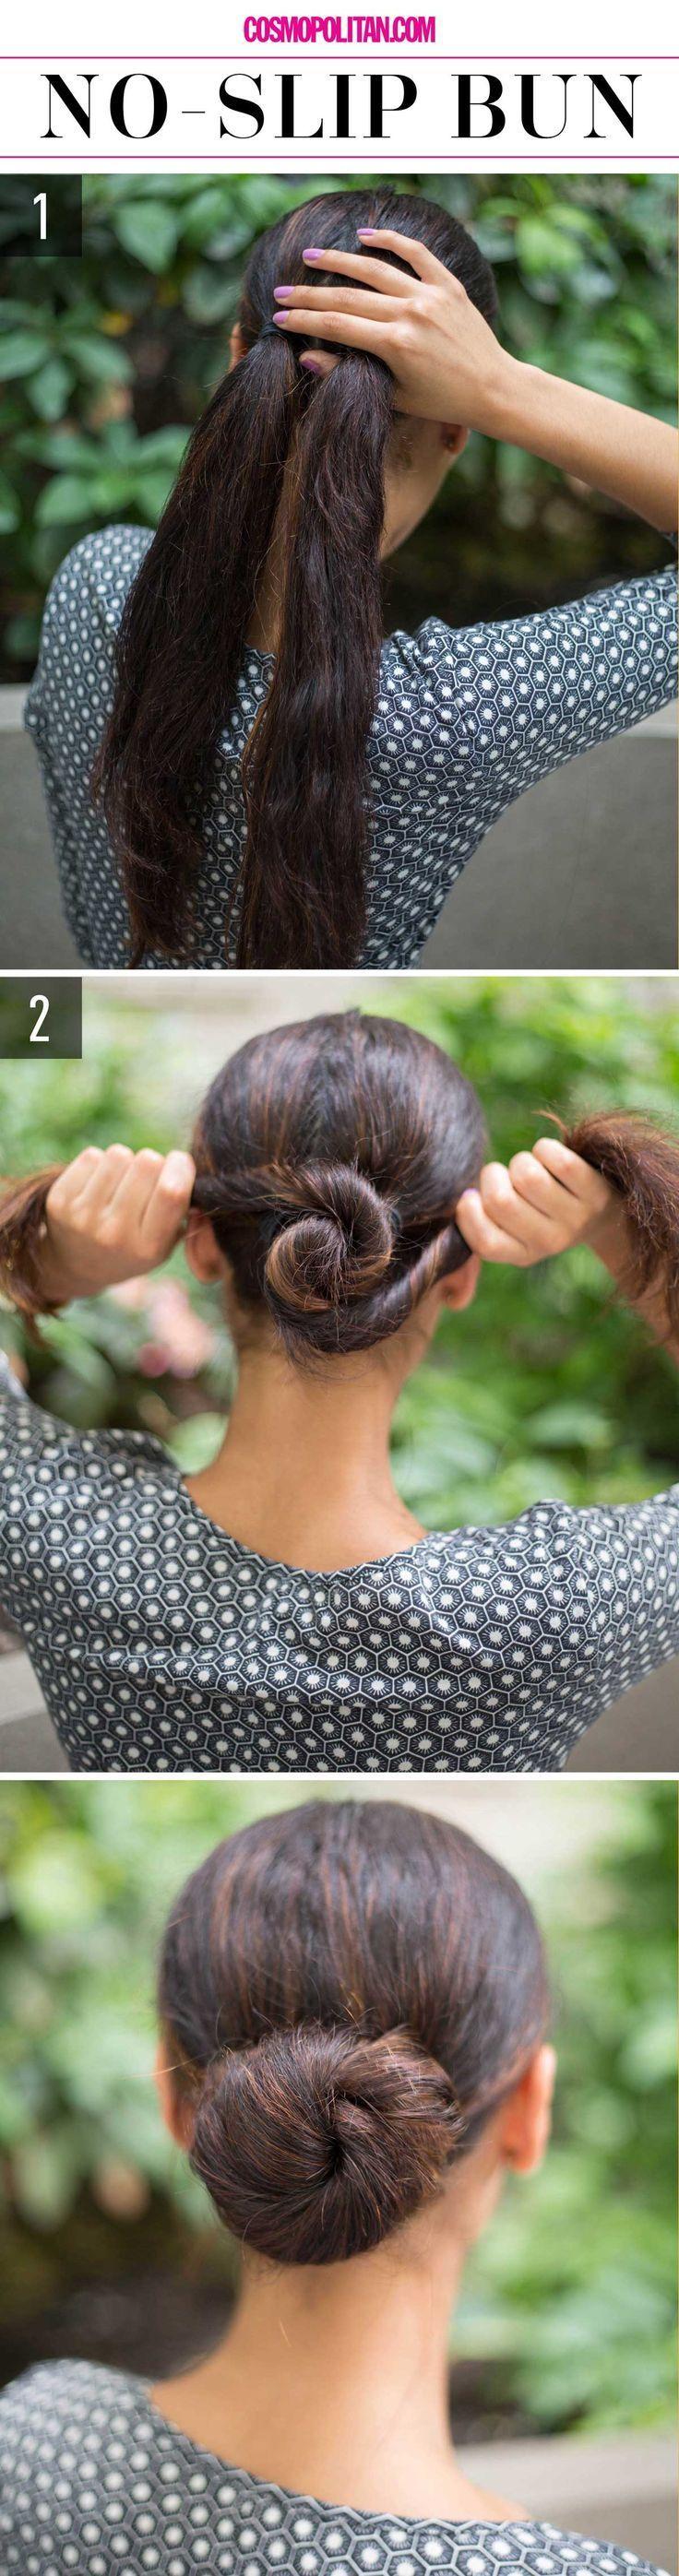 25 unique Low bun hairstyles ideas on Pinterest